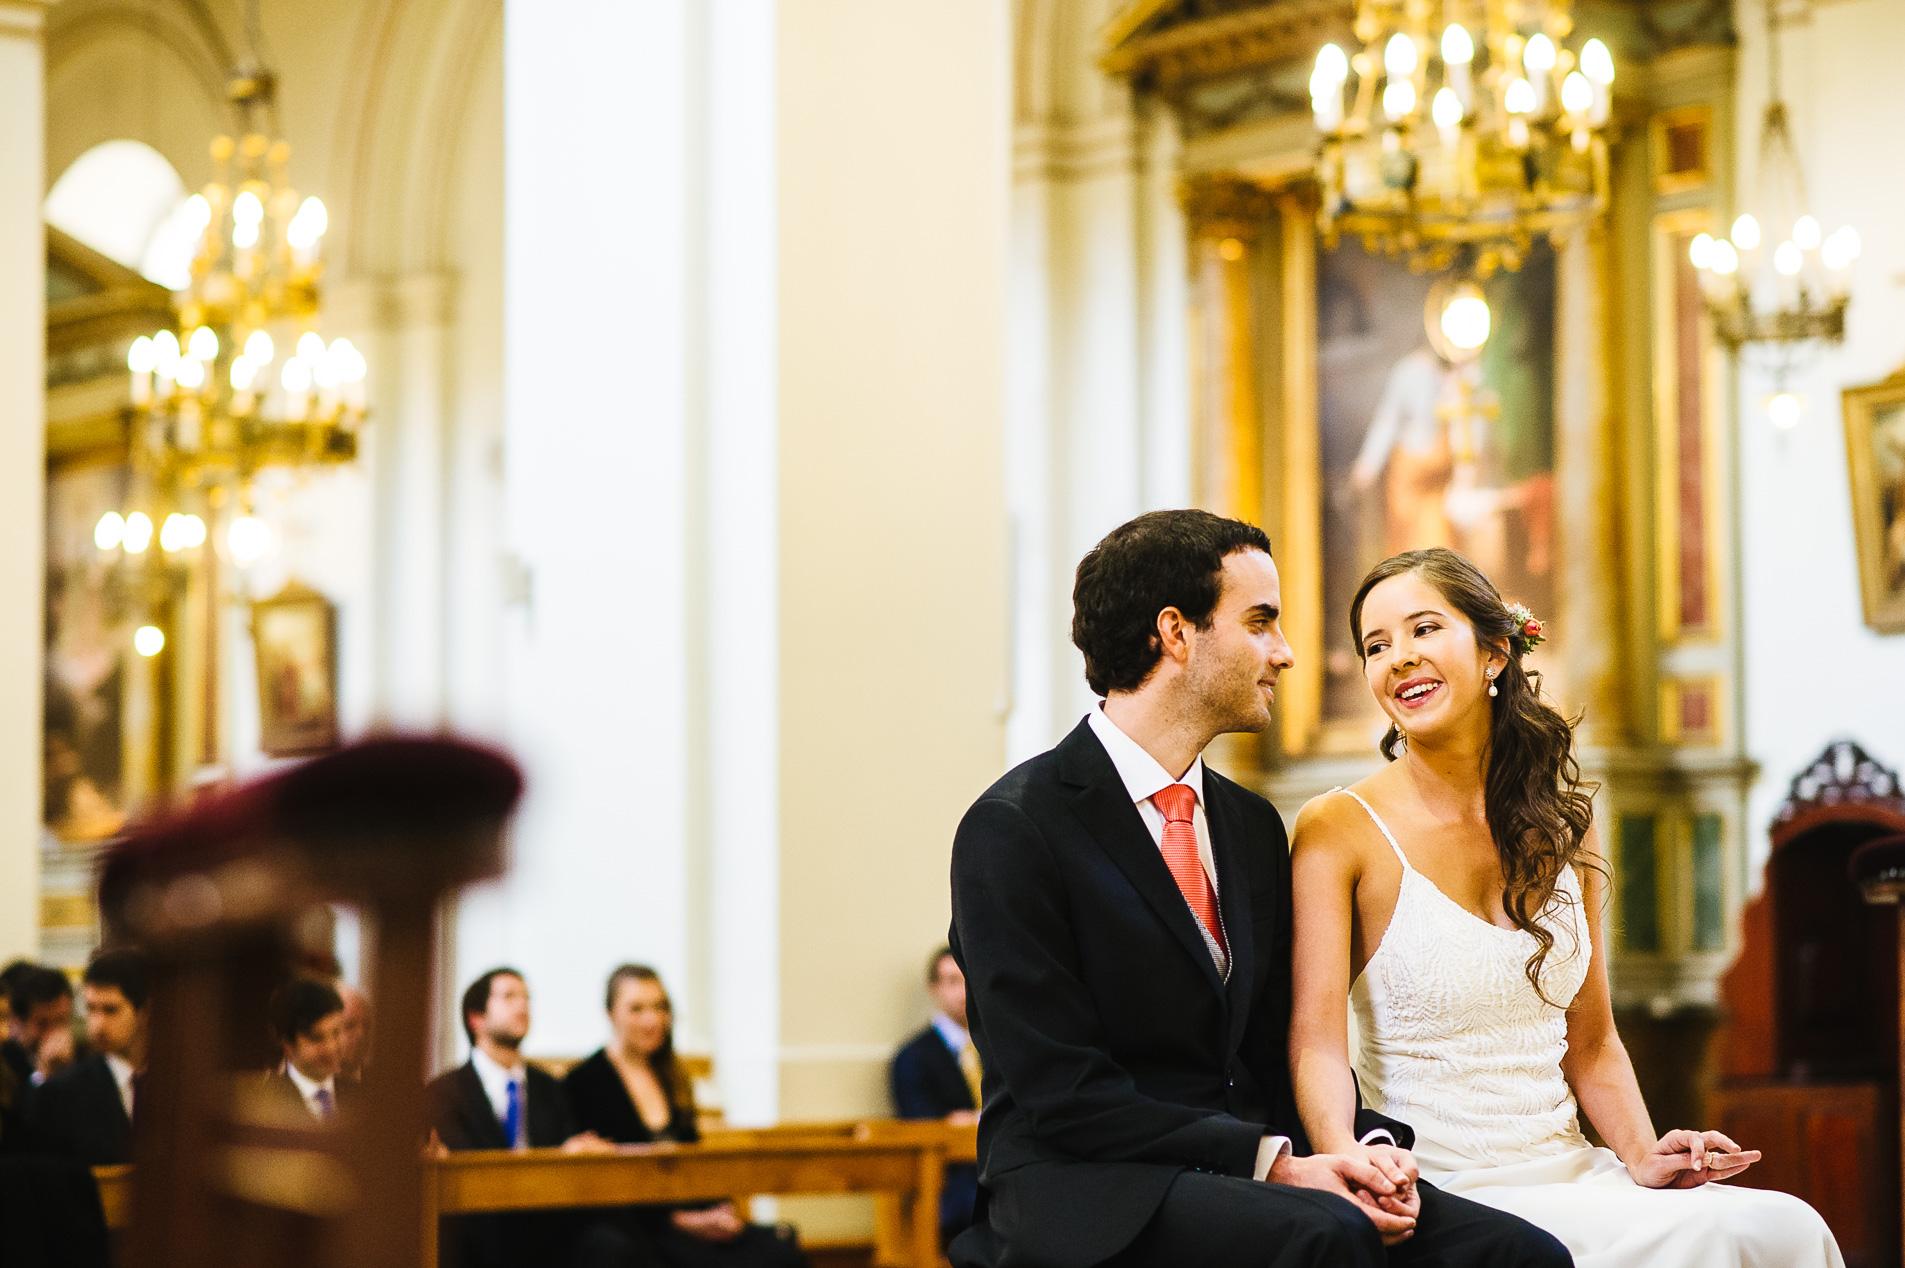 Pacita-Diego-matrimonio-otoño-12